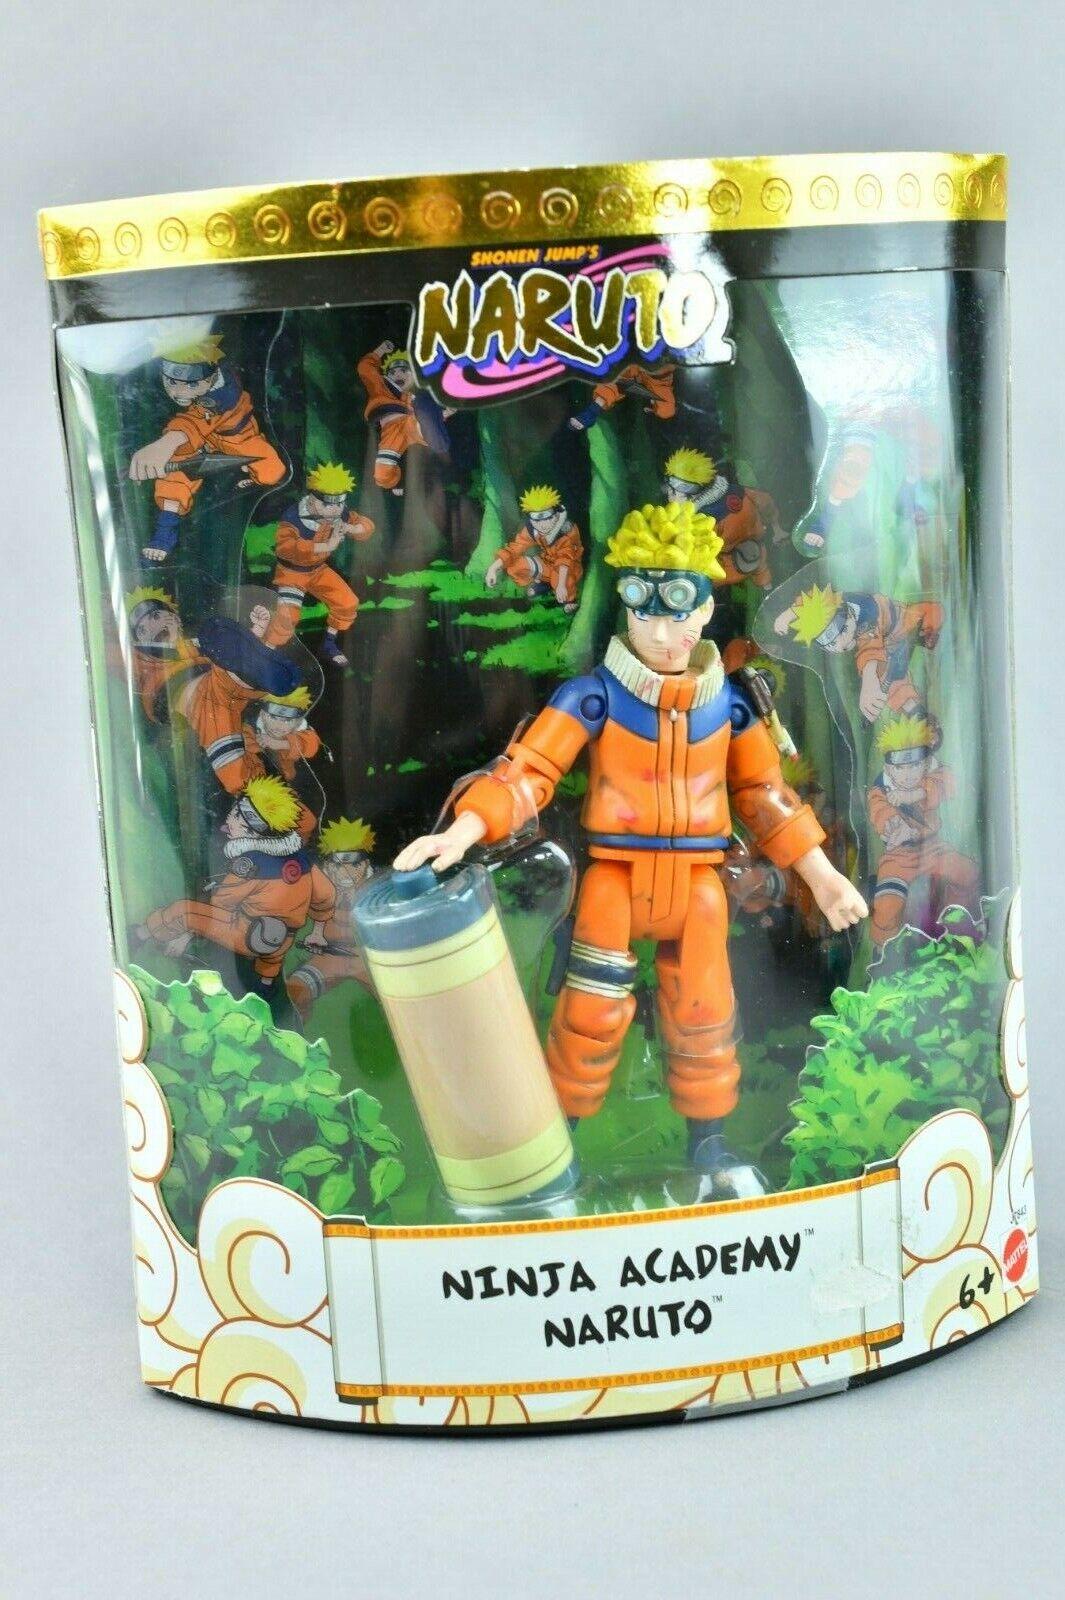 Naruto Ninja Academy Mattel MISB SDCC Comic Con Battle Damaged